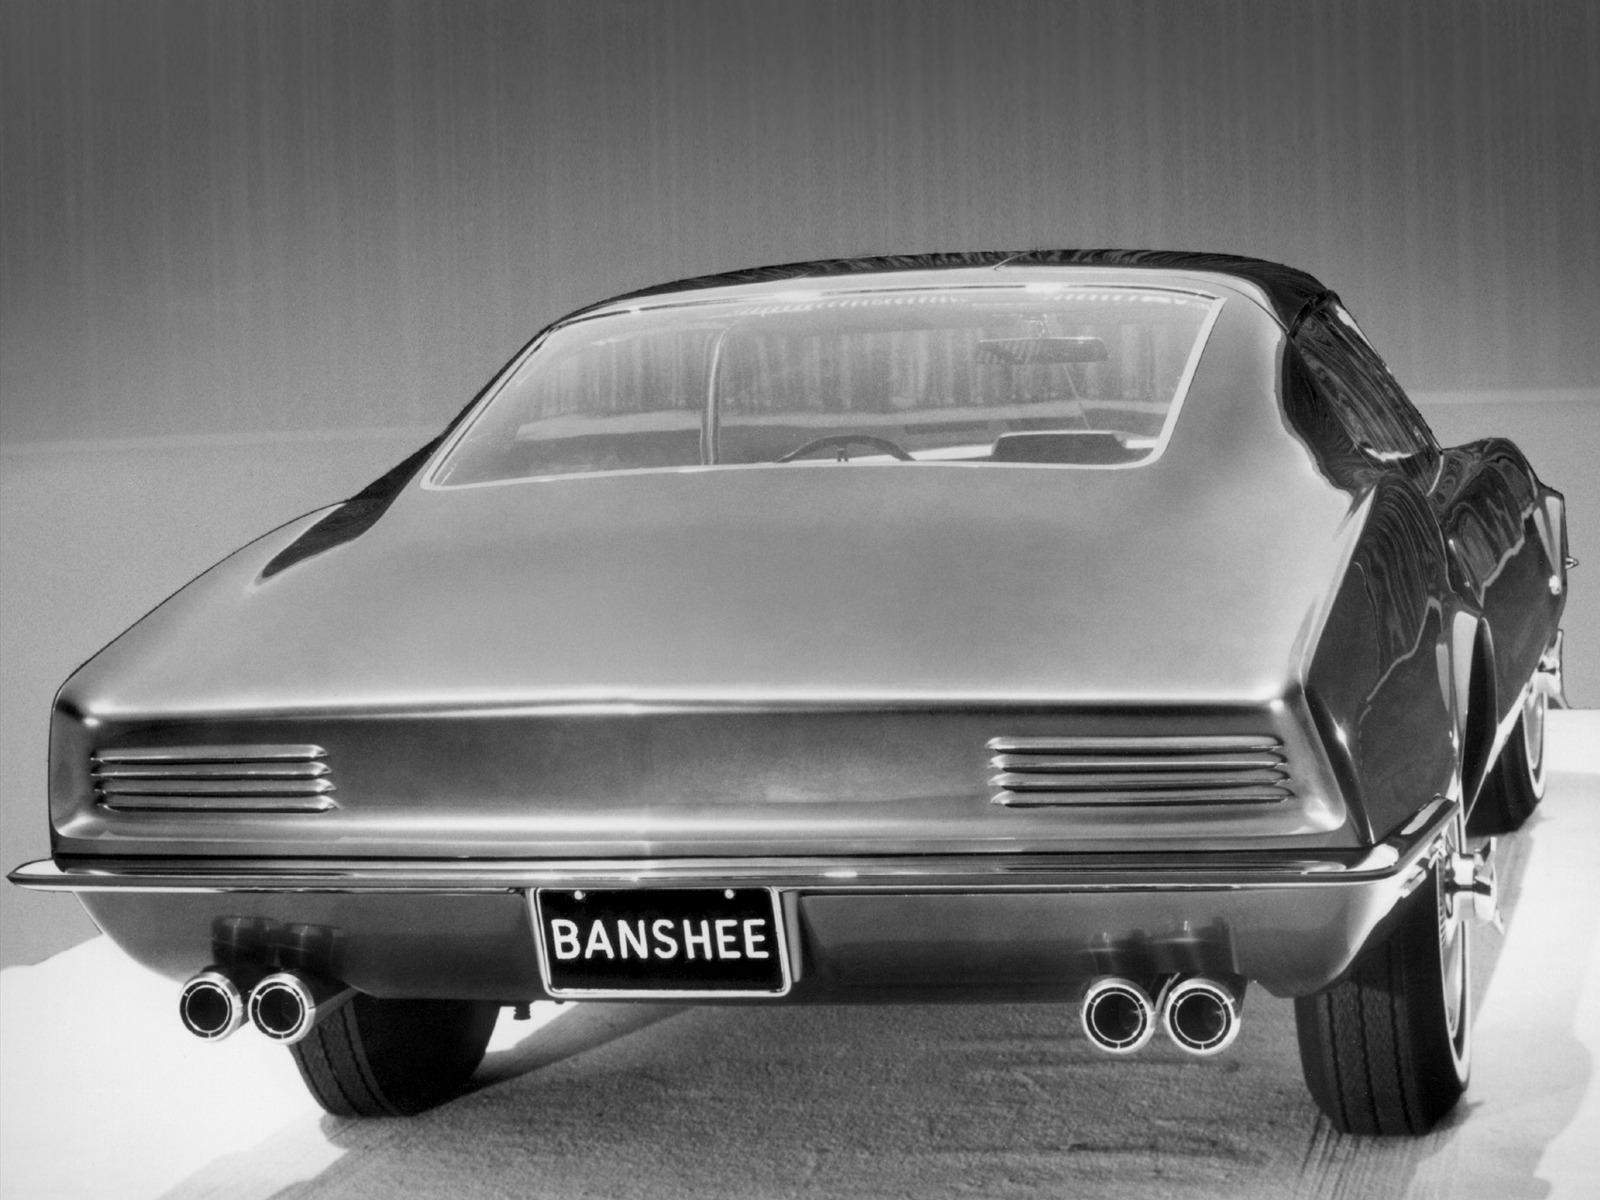 How To Flip Cars >> Pontiac Banshee XP-798 Concept Car (1966) - Old Concept Cars